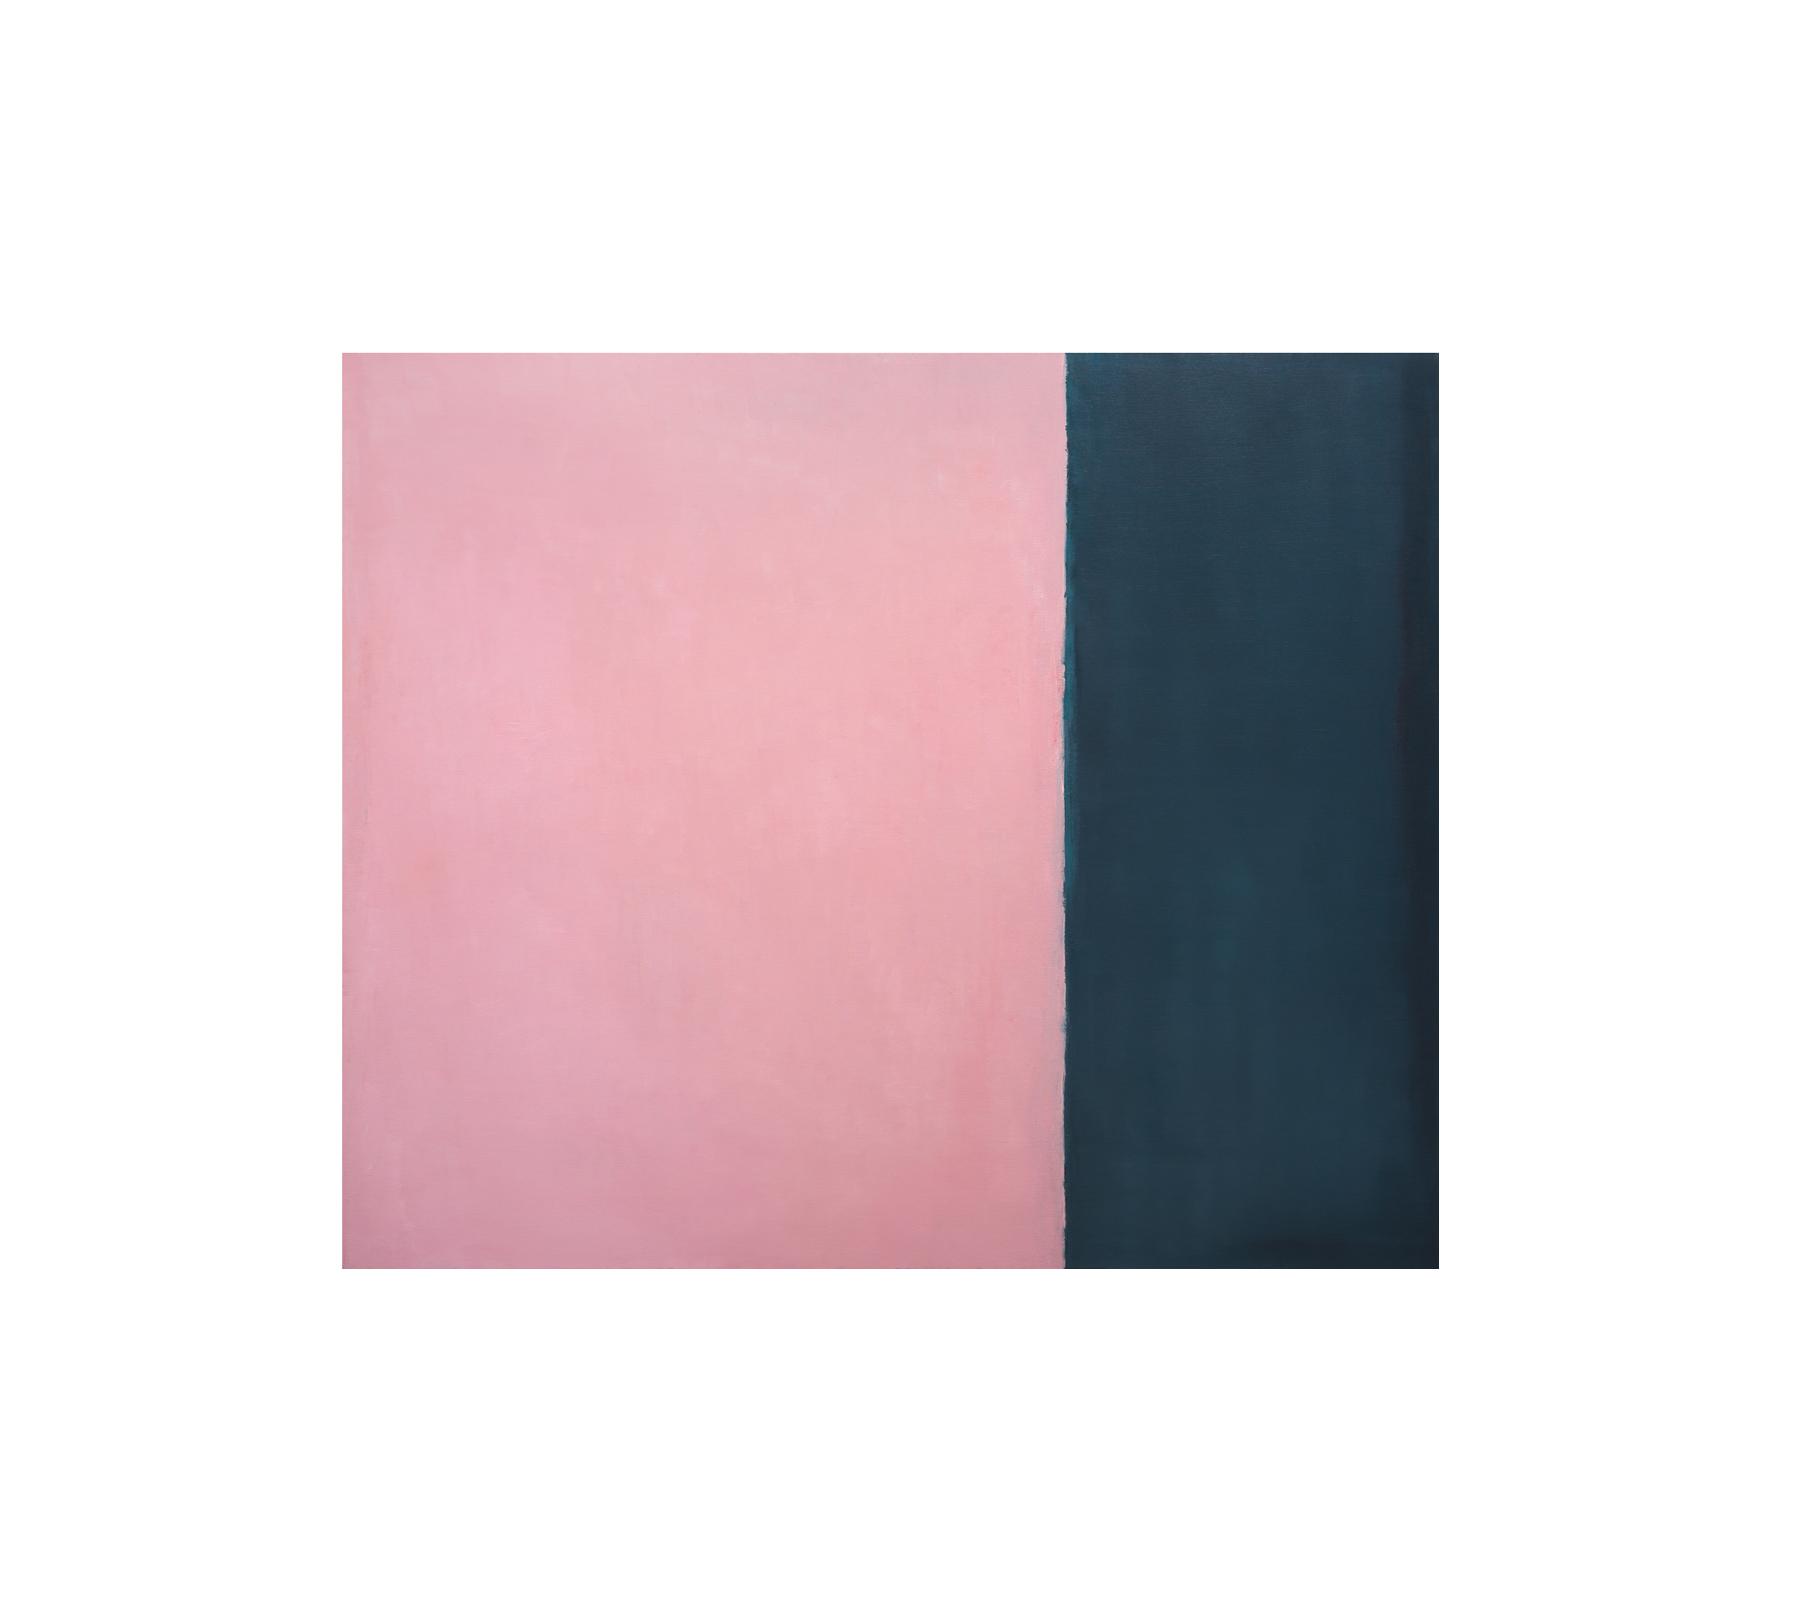 Untitled 2018 150x180cm